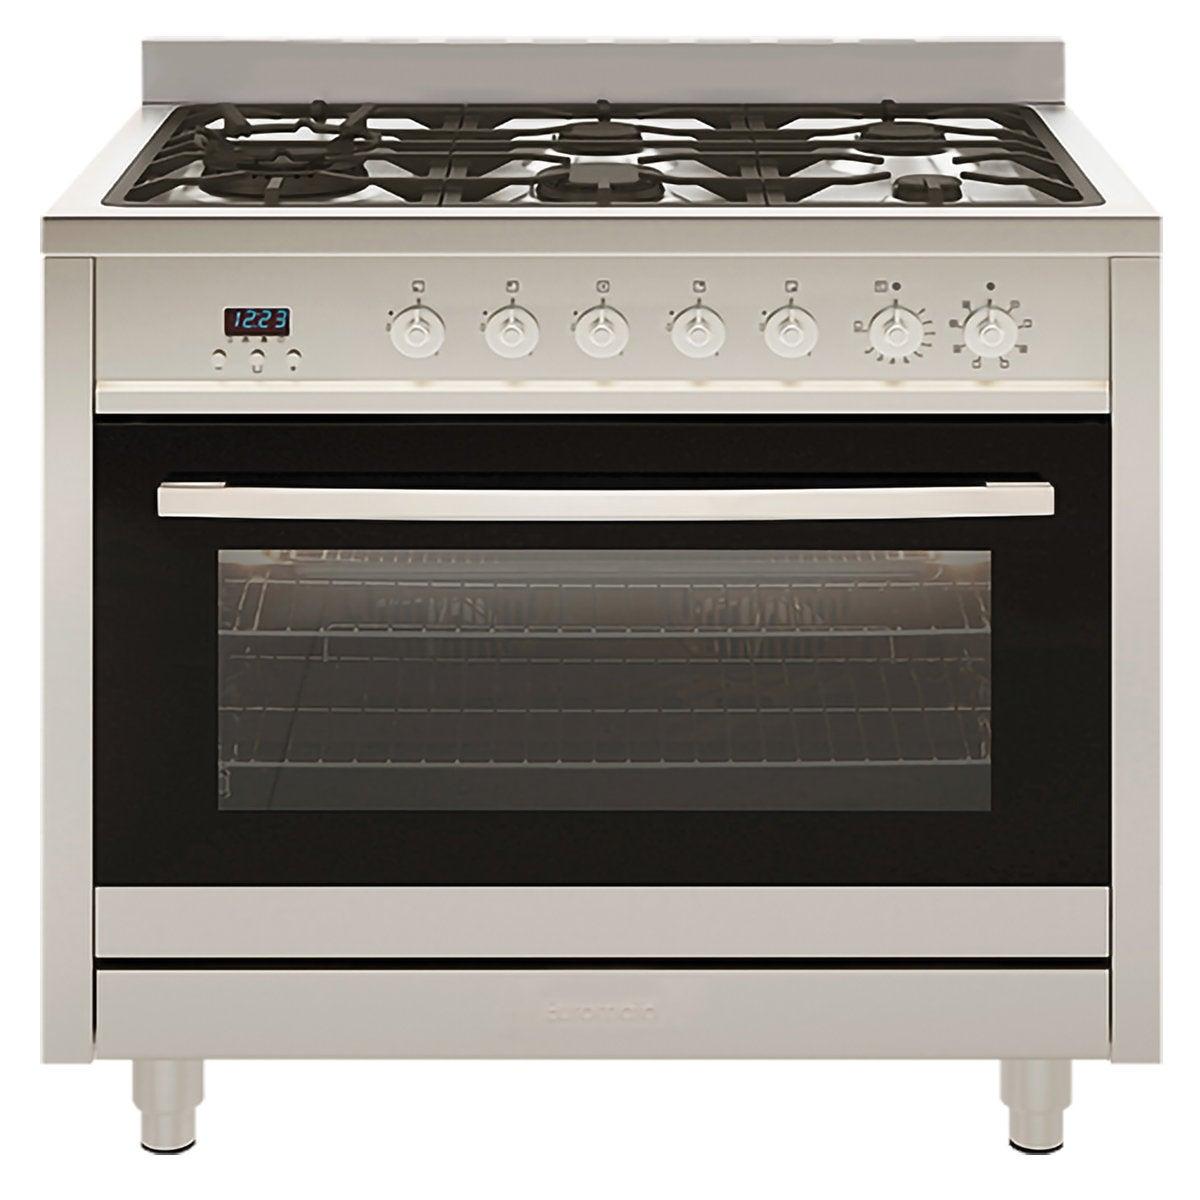 Euromaid EG90S Oven